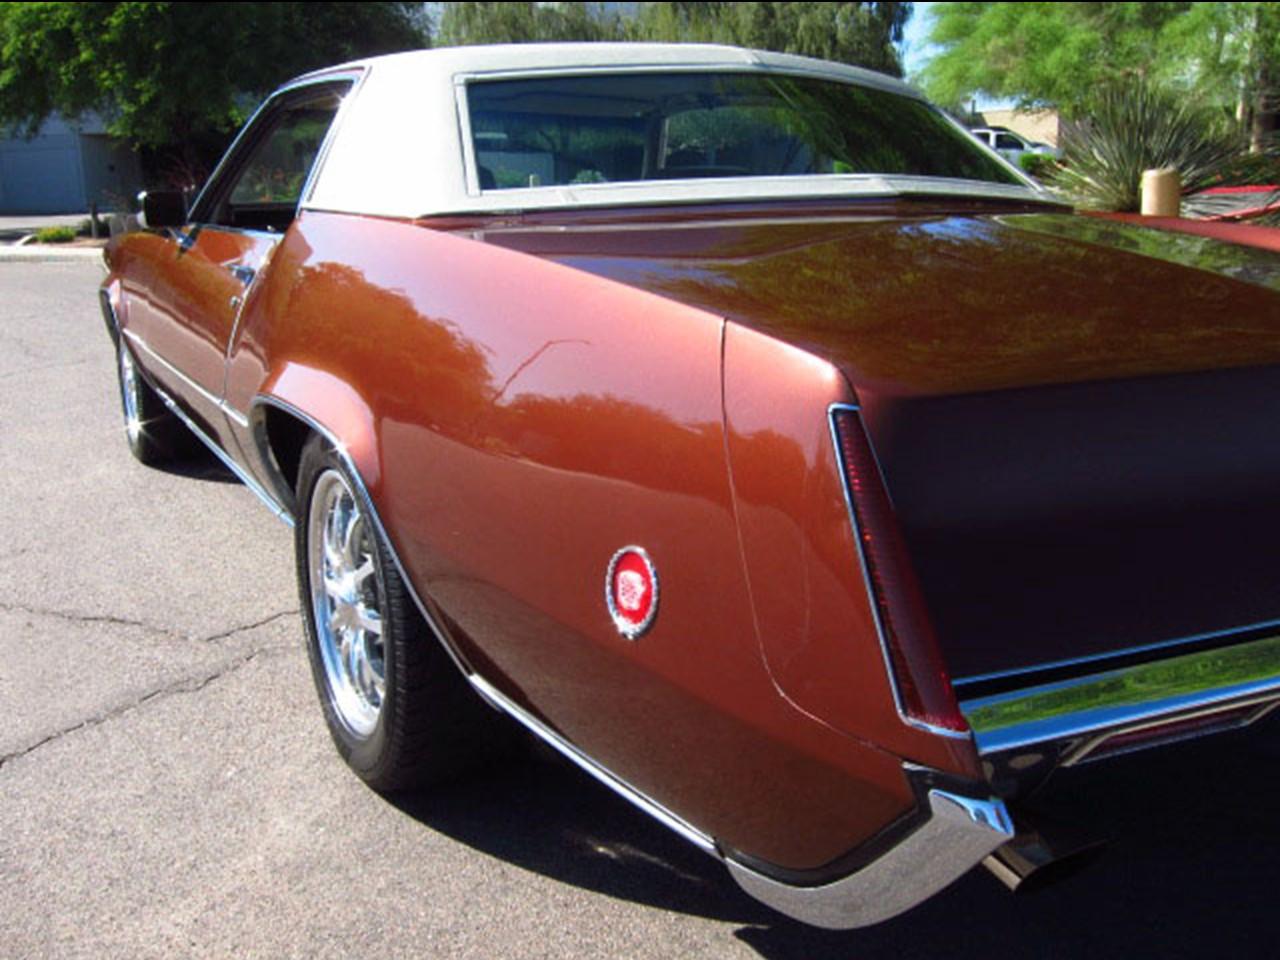 1970 Eldorado tail fin